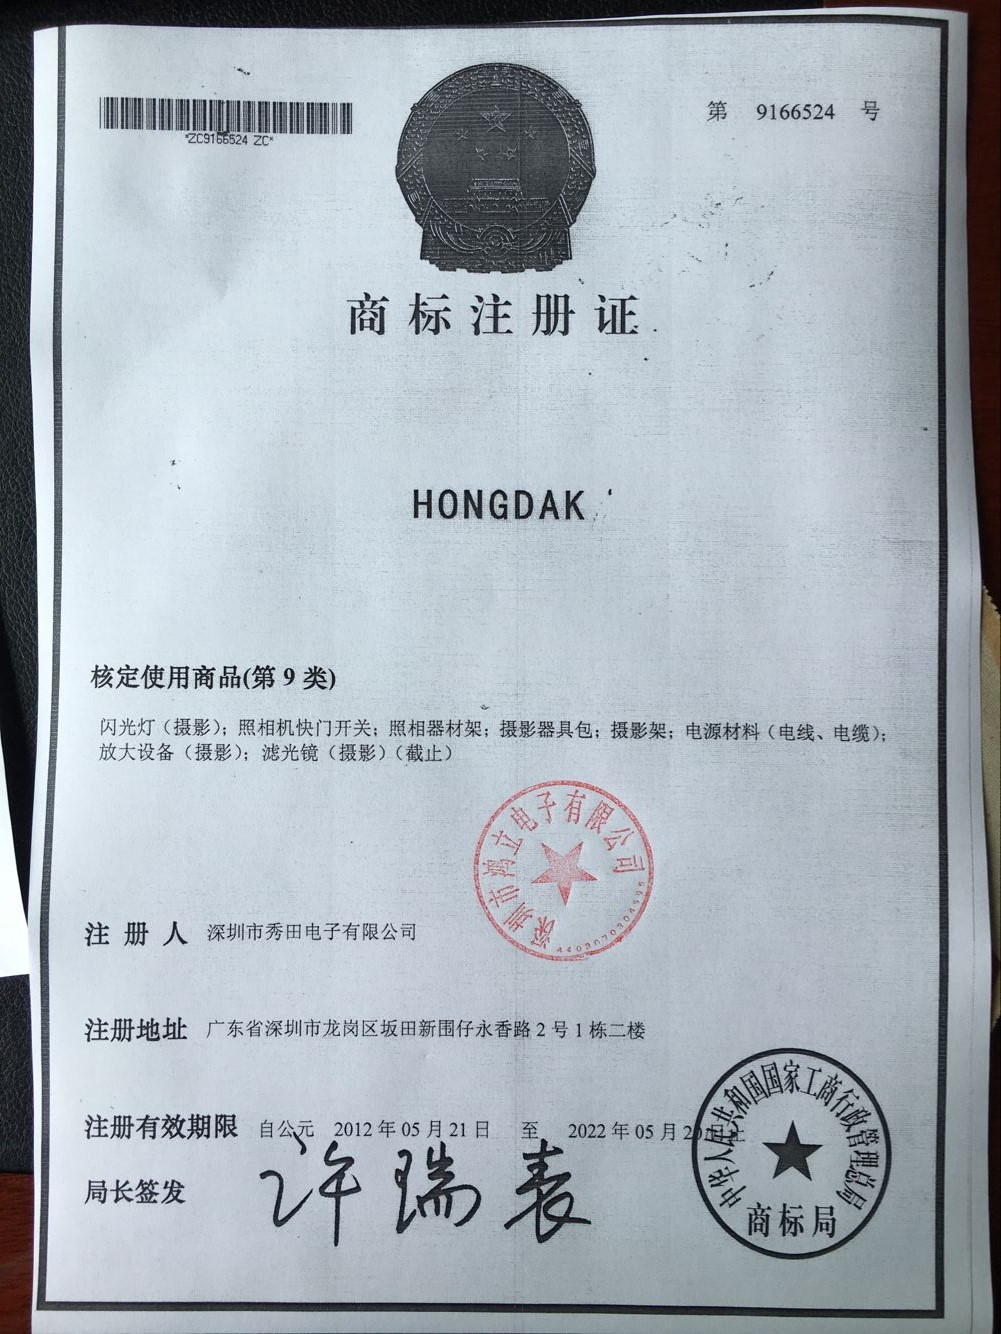 HONGDAK